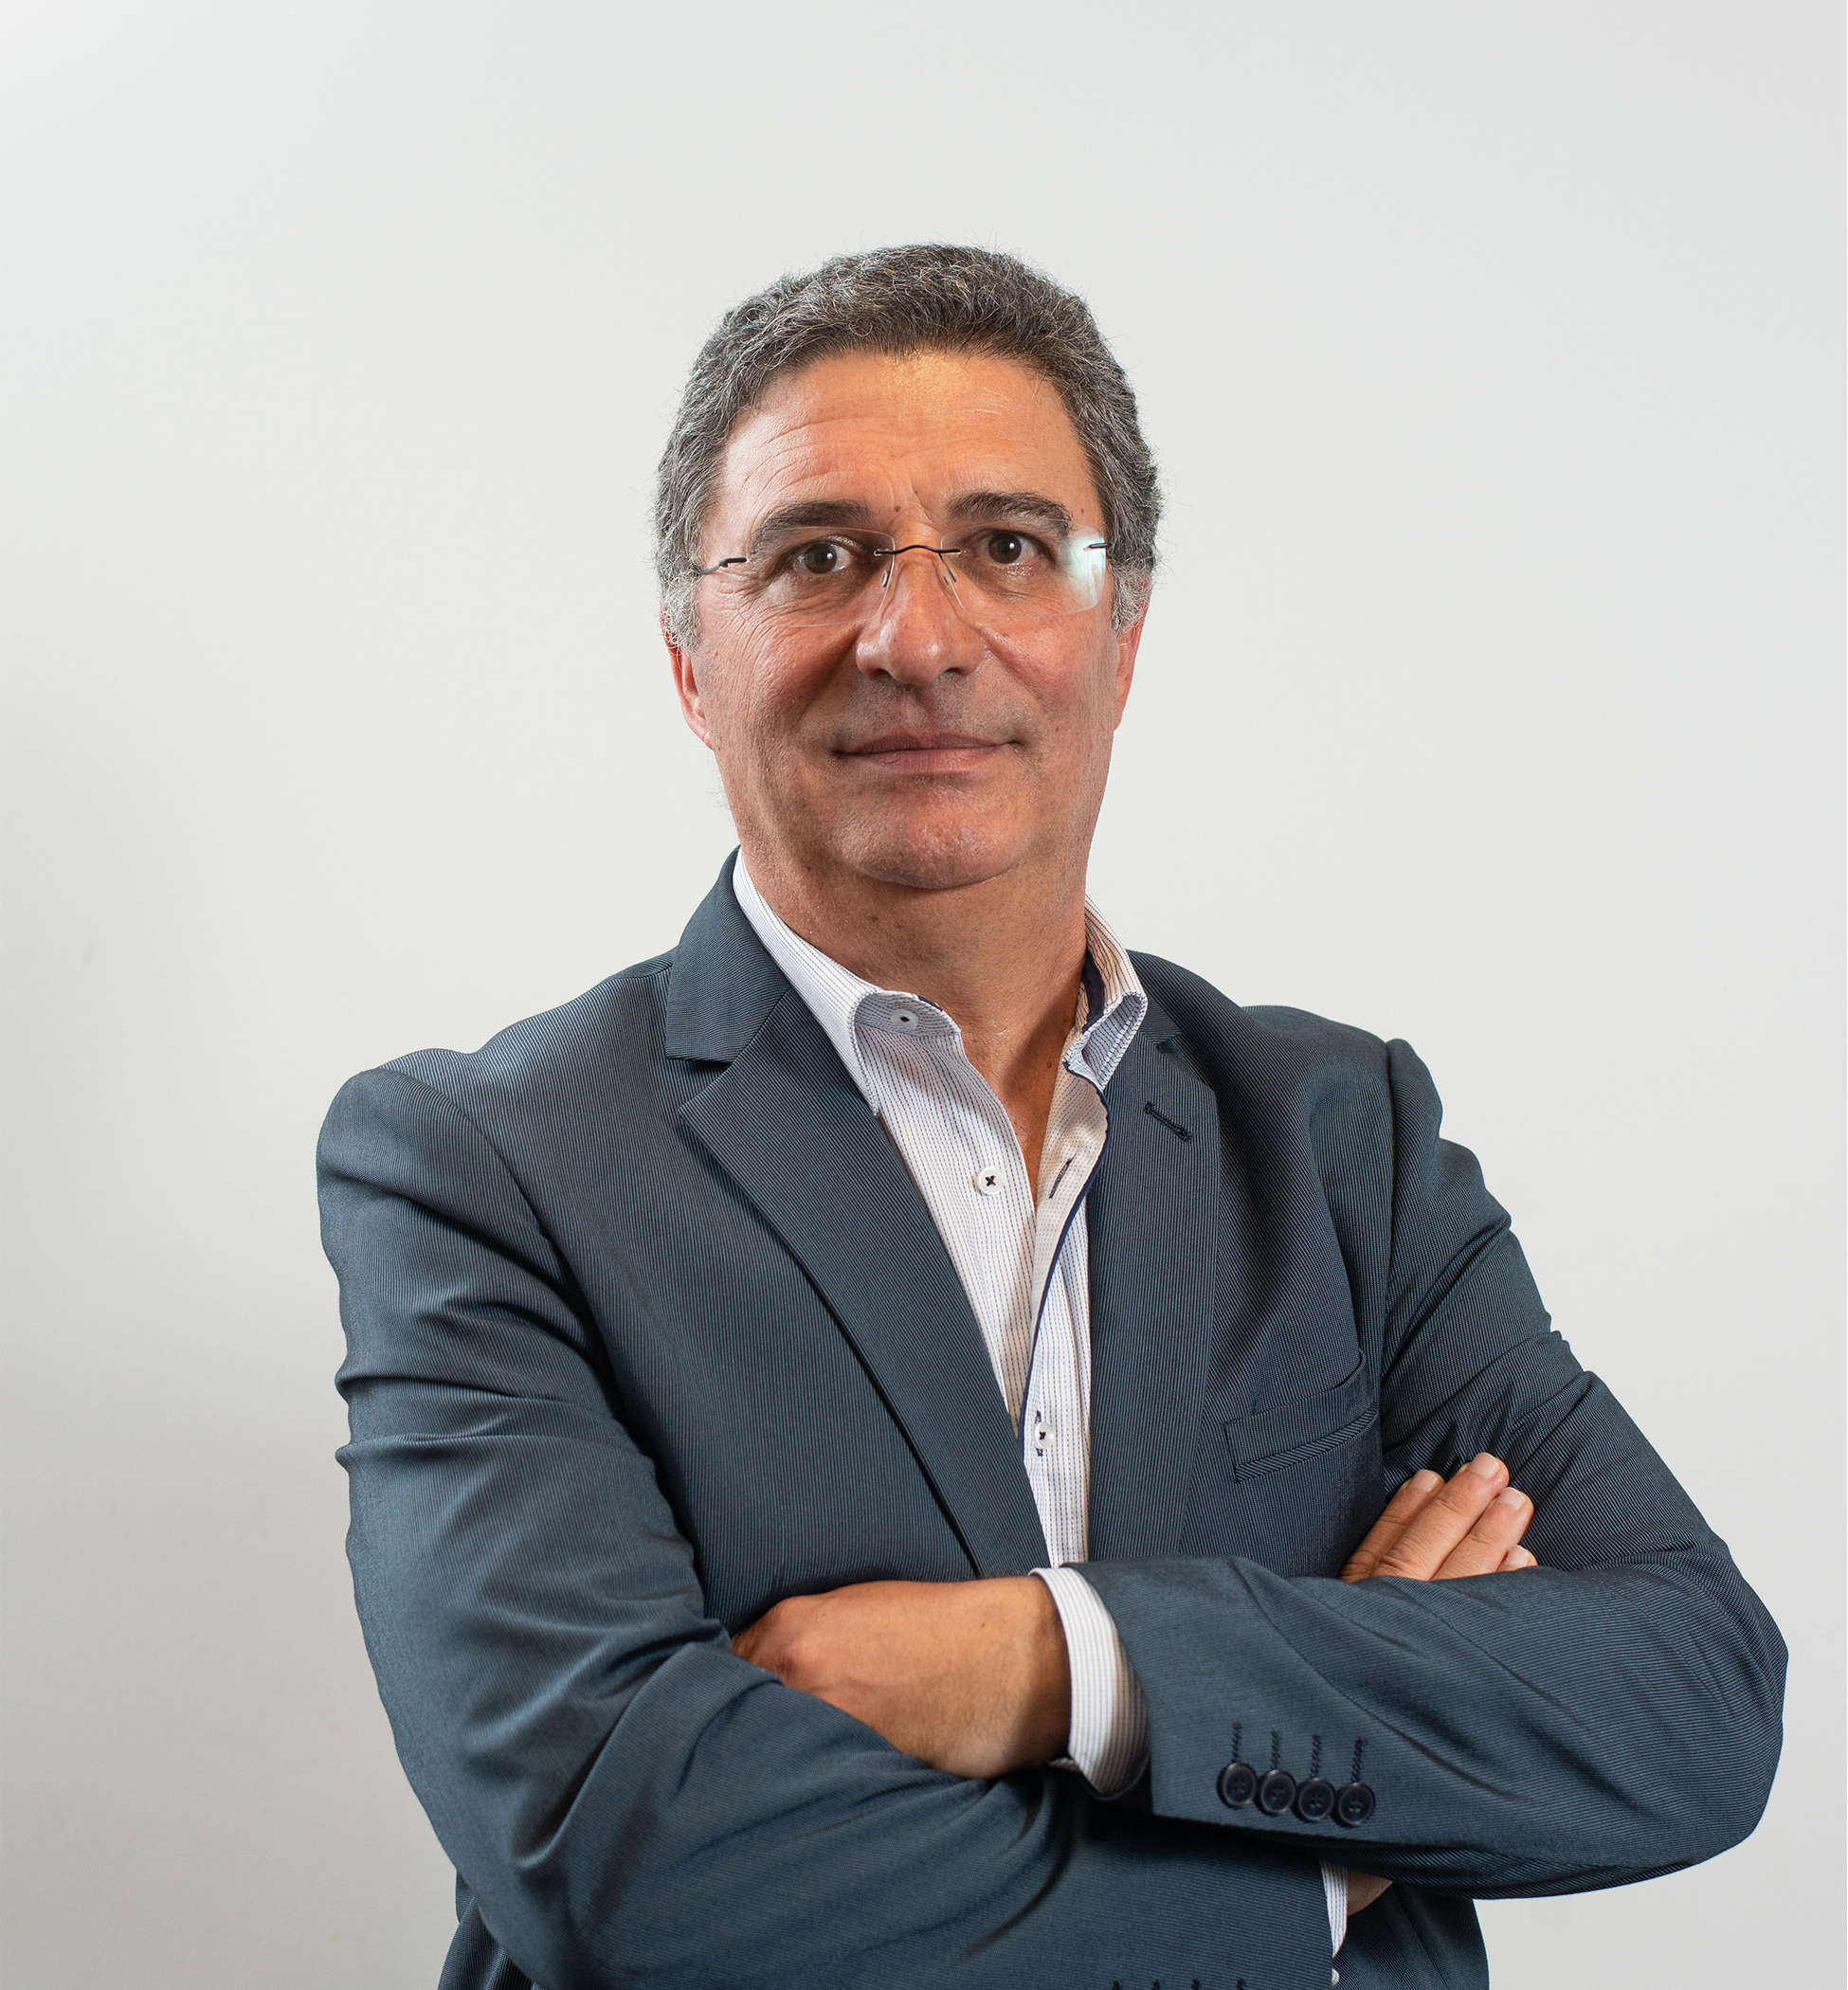 PROFESSOR DOUTOR CASIMIRO RAMOS